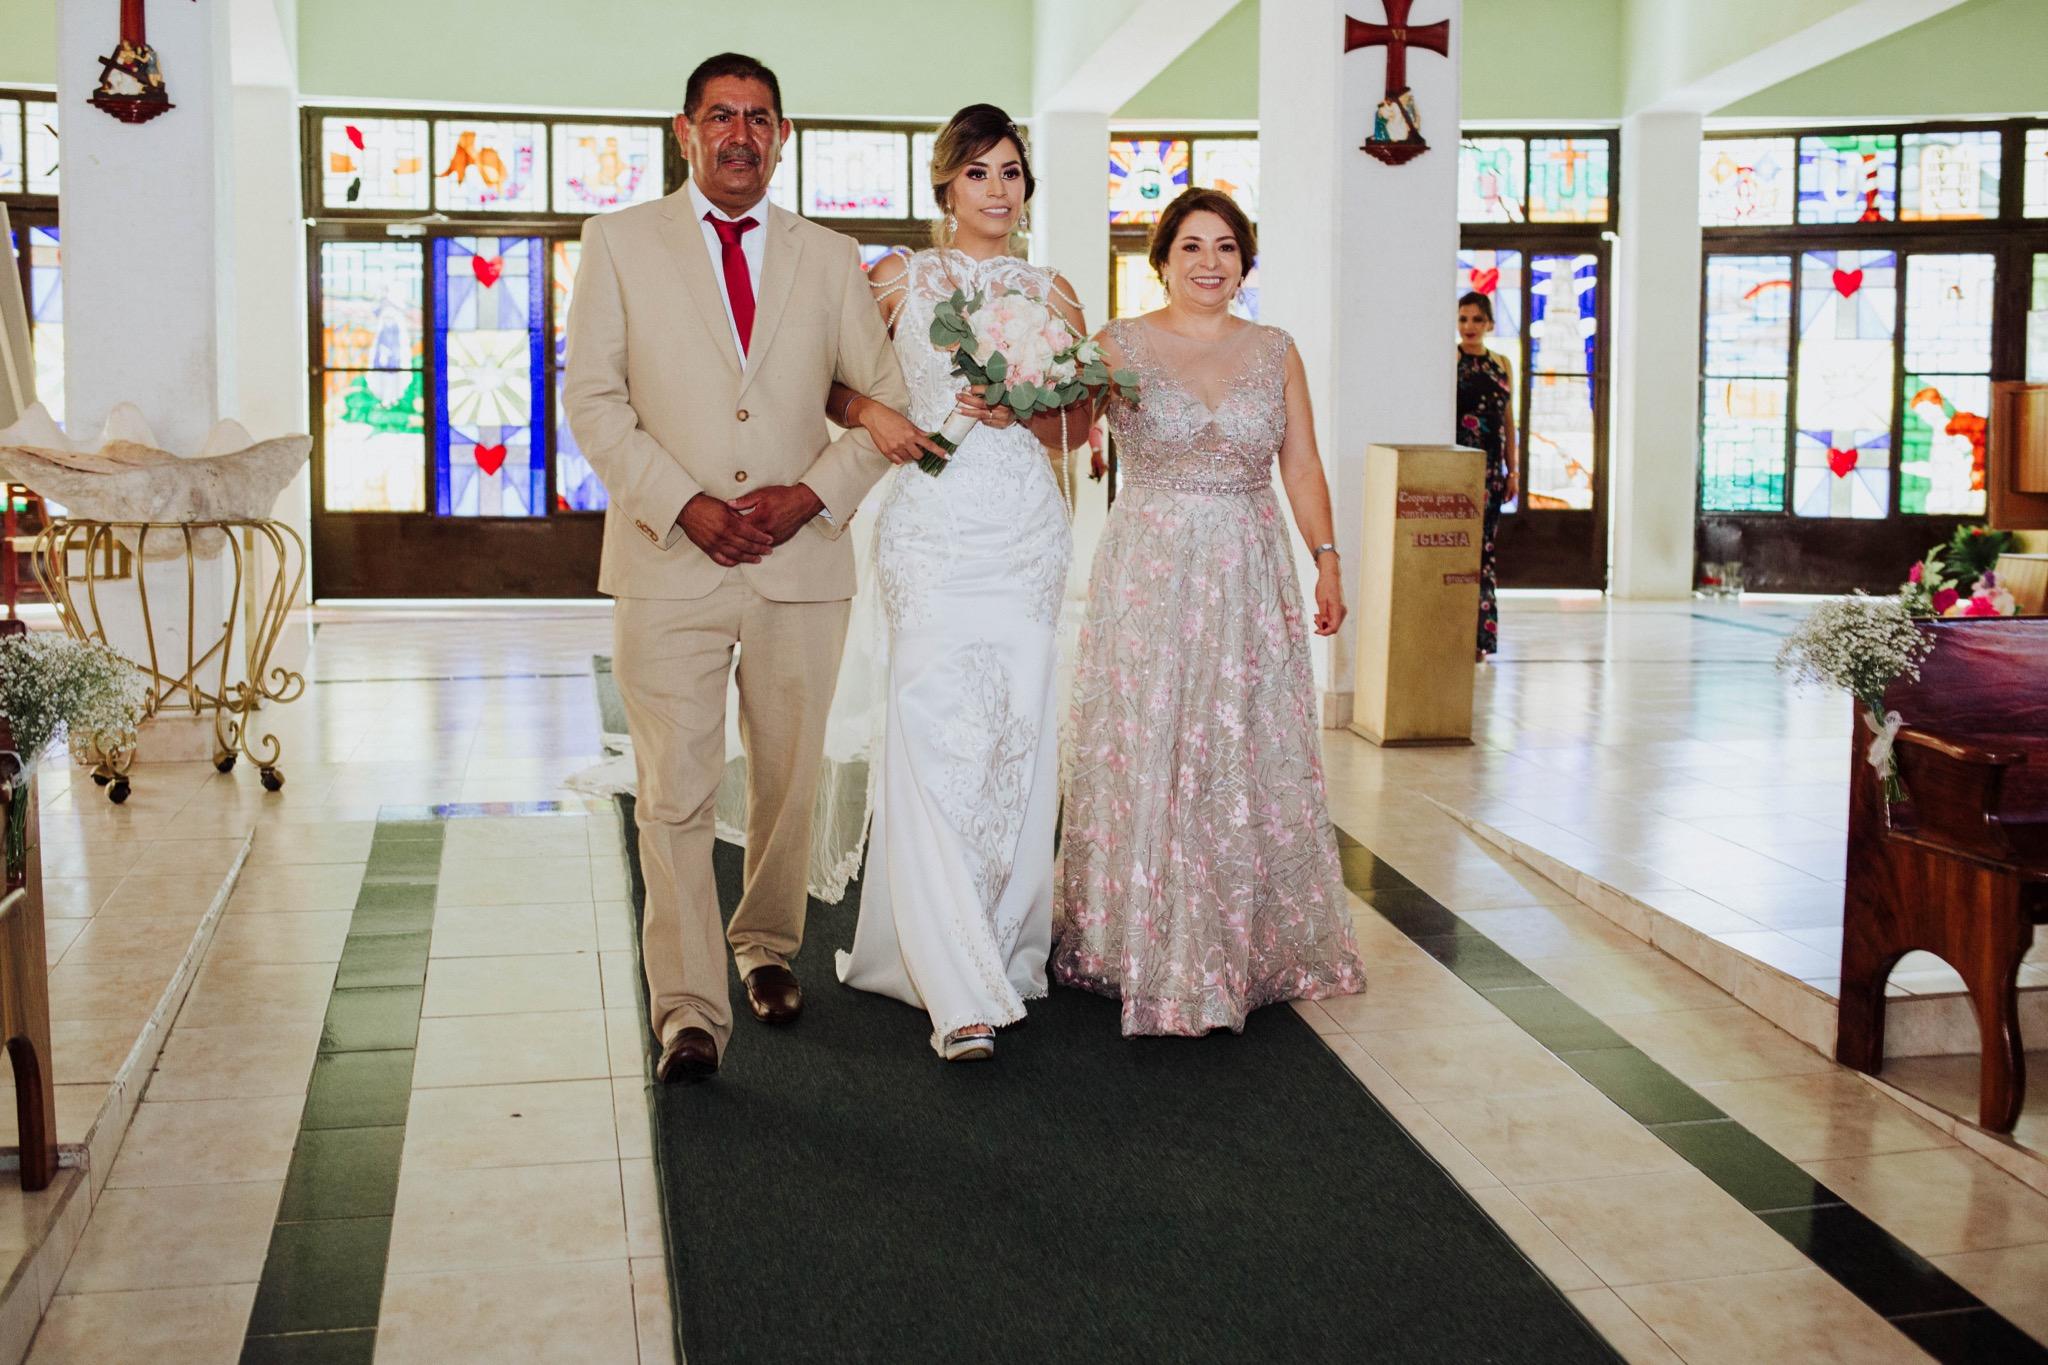 Javier_noriega_fotografo_bodas_profesional_zacatecas_mexico_mazatlan_sinaloa_photographer_weddings20